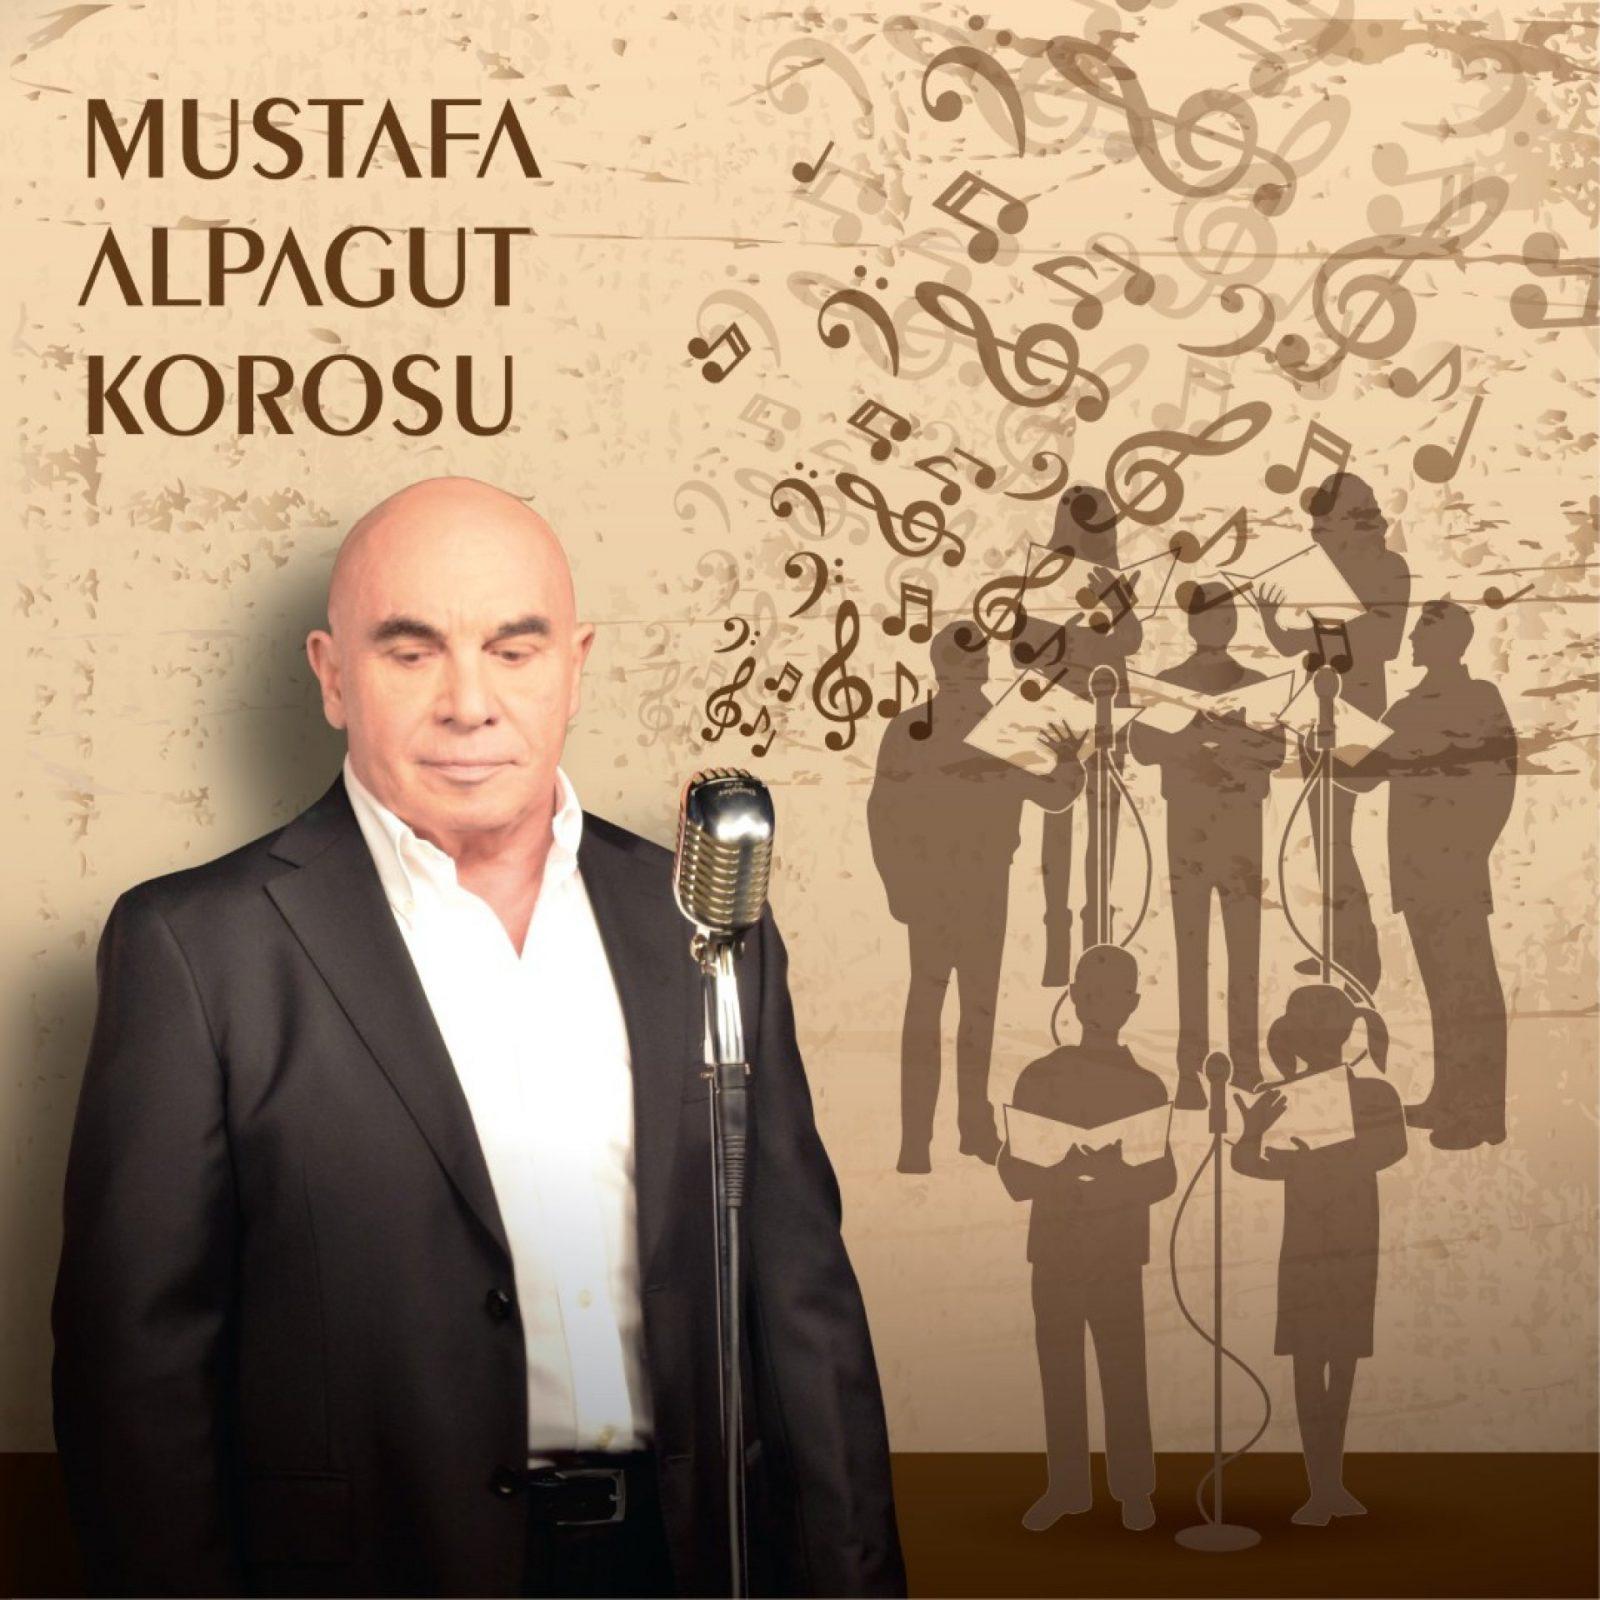 mustafa alpagut korosu albüm kapağı